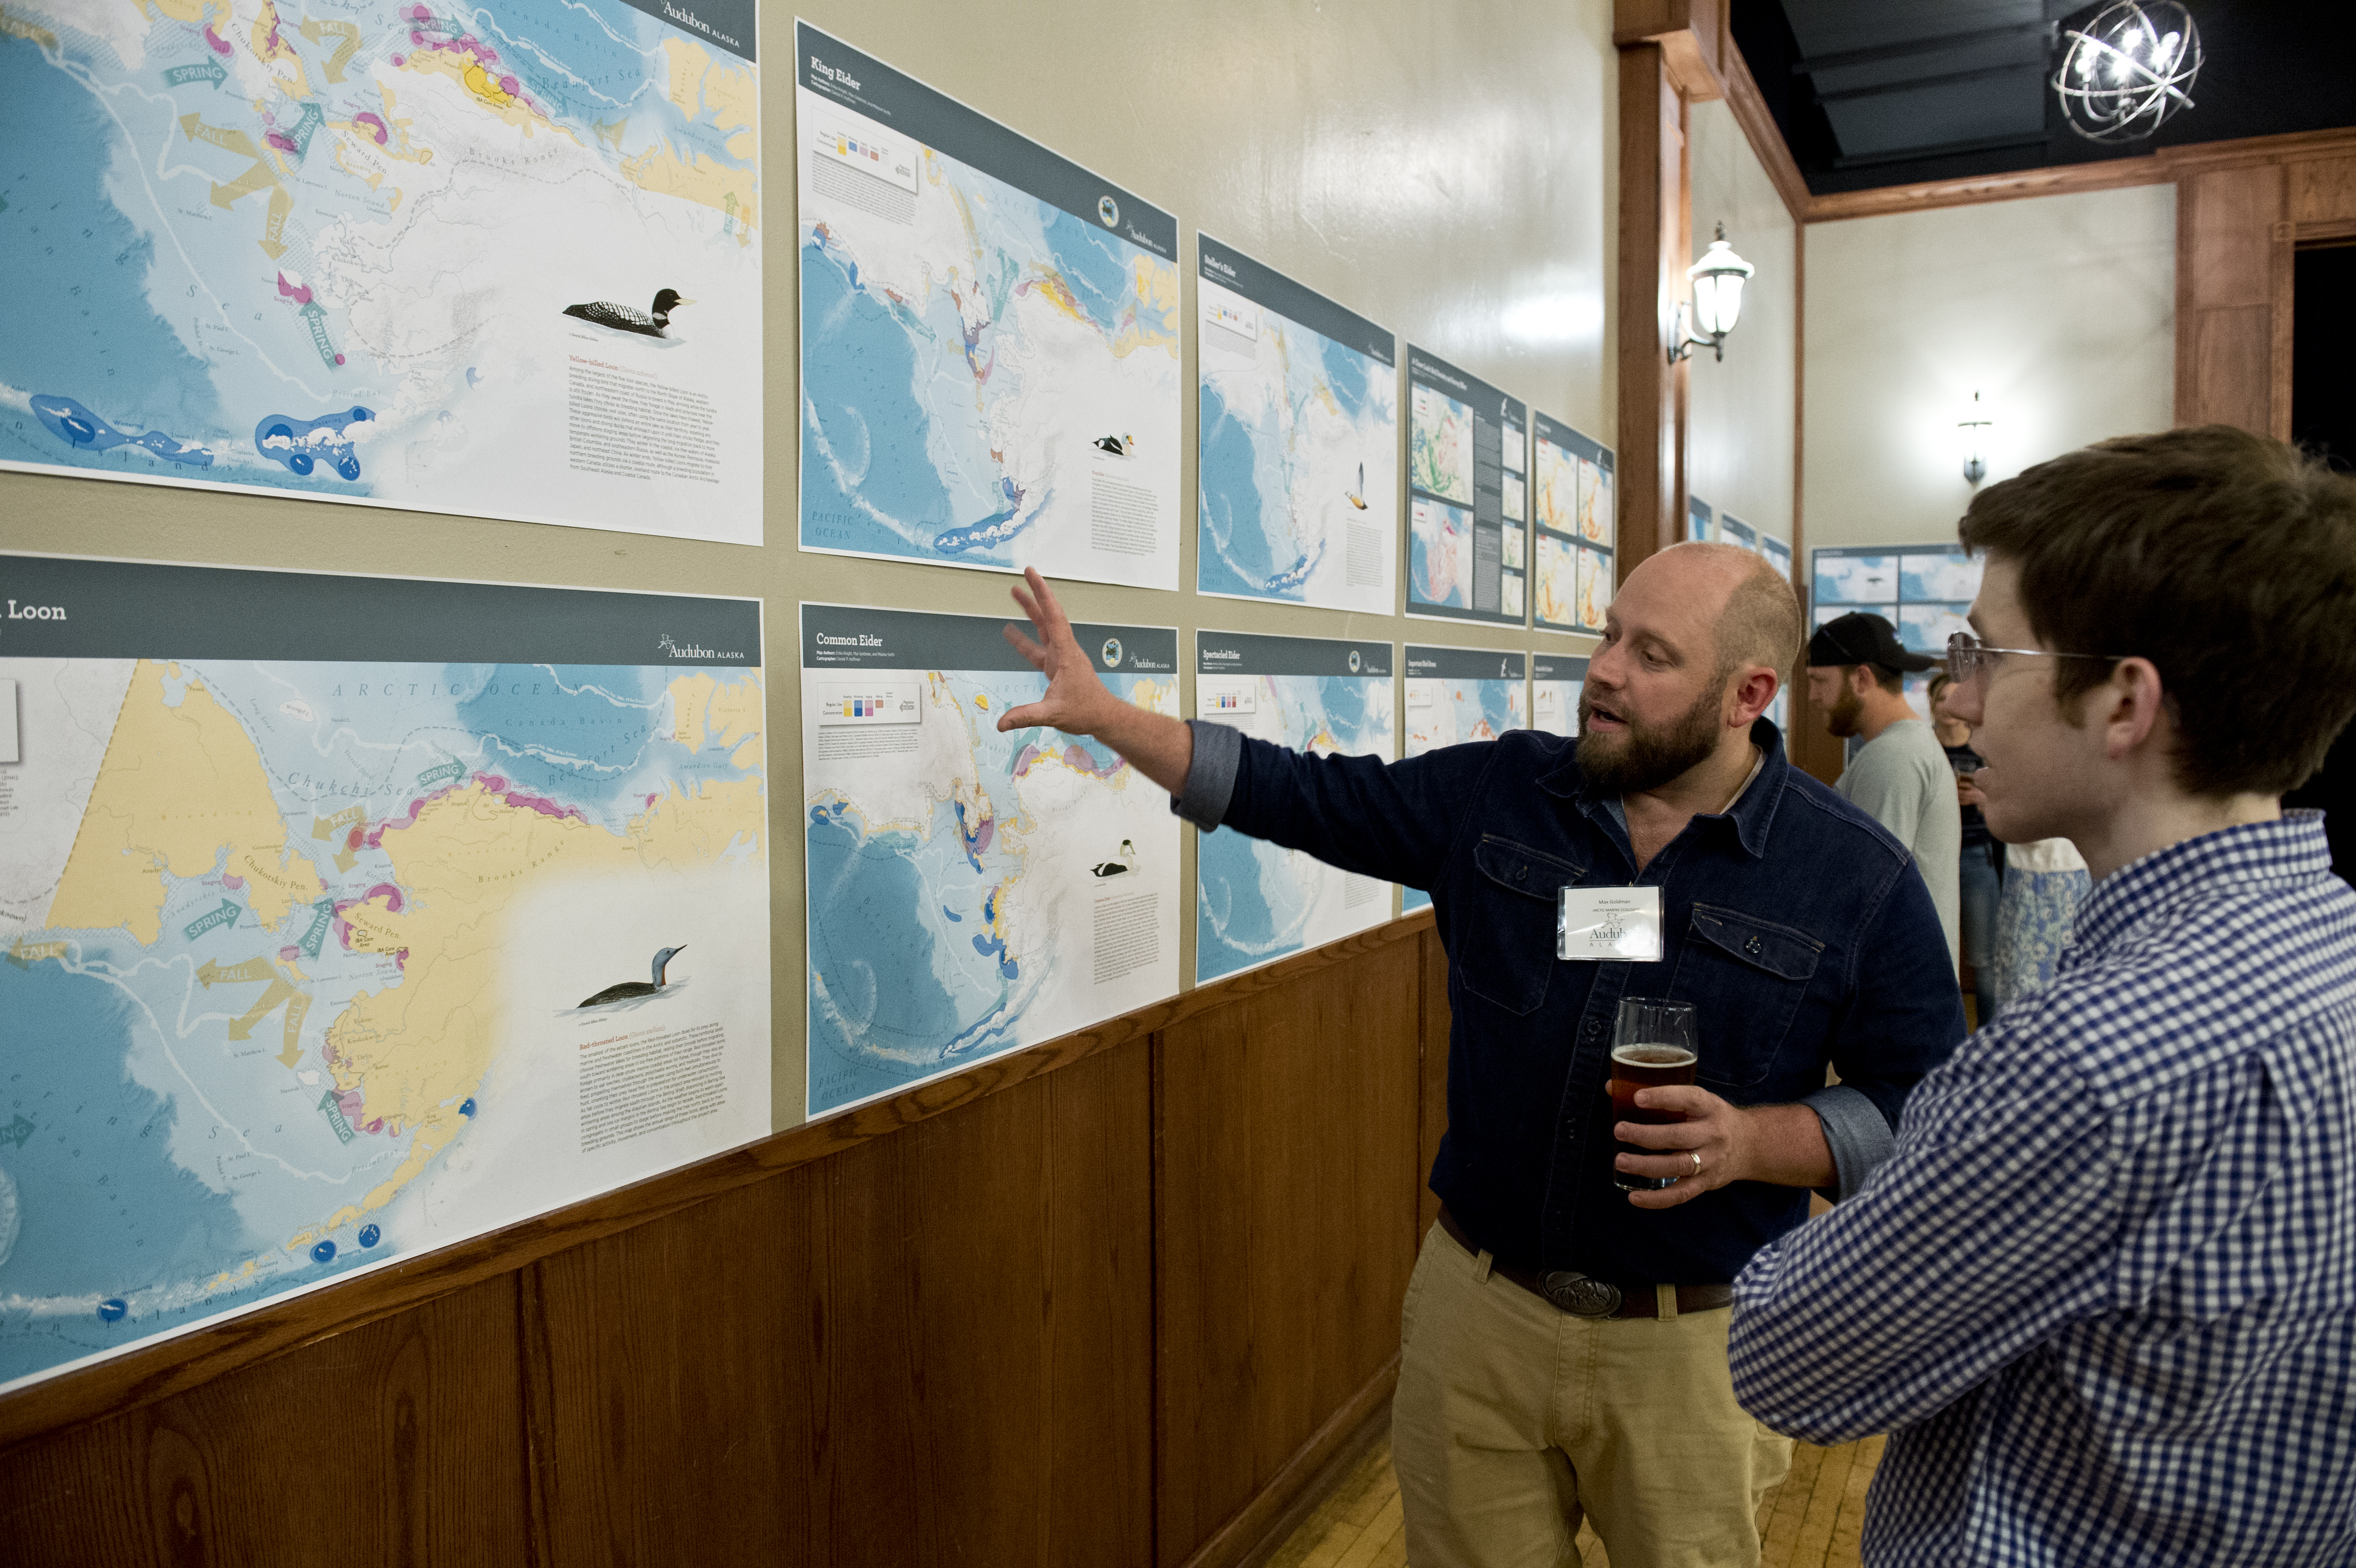 New Arctic Alaska marine atlas details ecosystems of the changing region